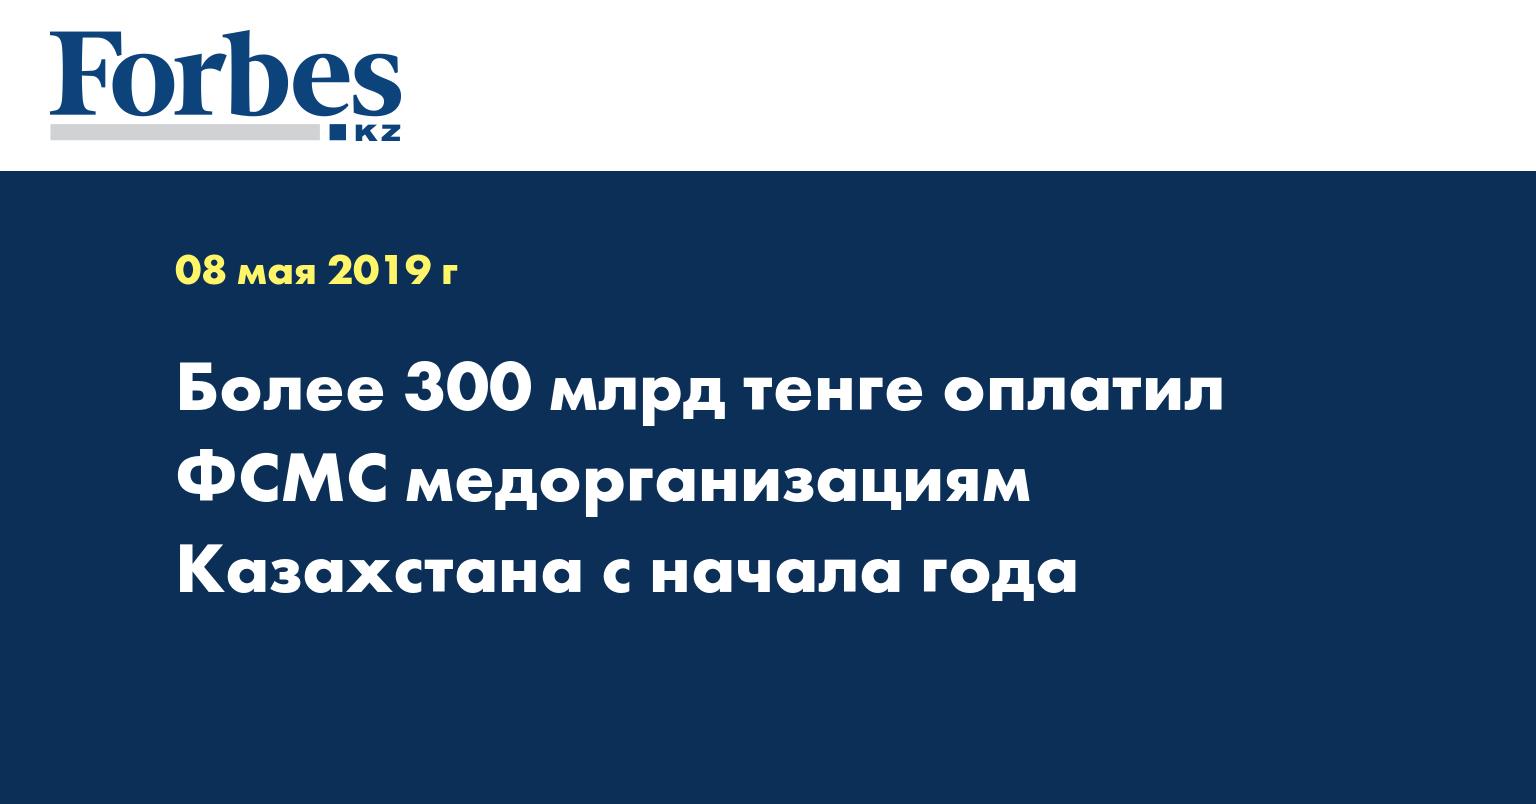 Более 300 млрд тенге оплатил ФСМС медорганизациям Казахстана с начала года